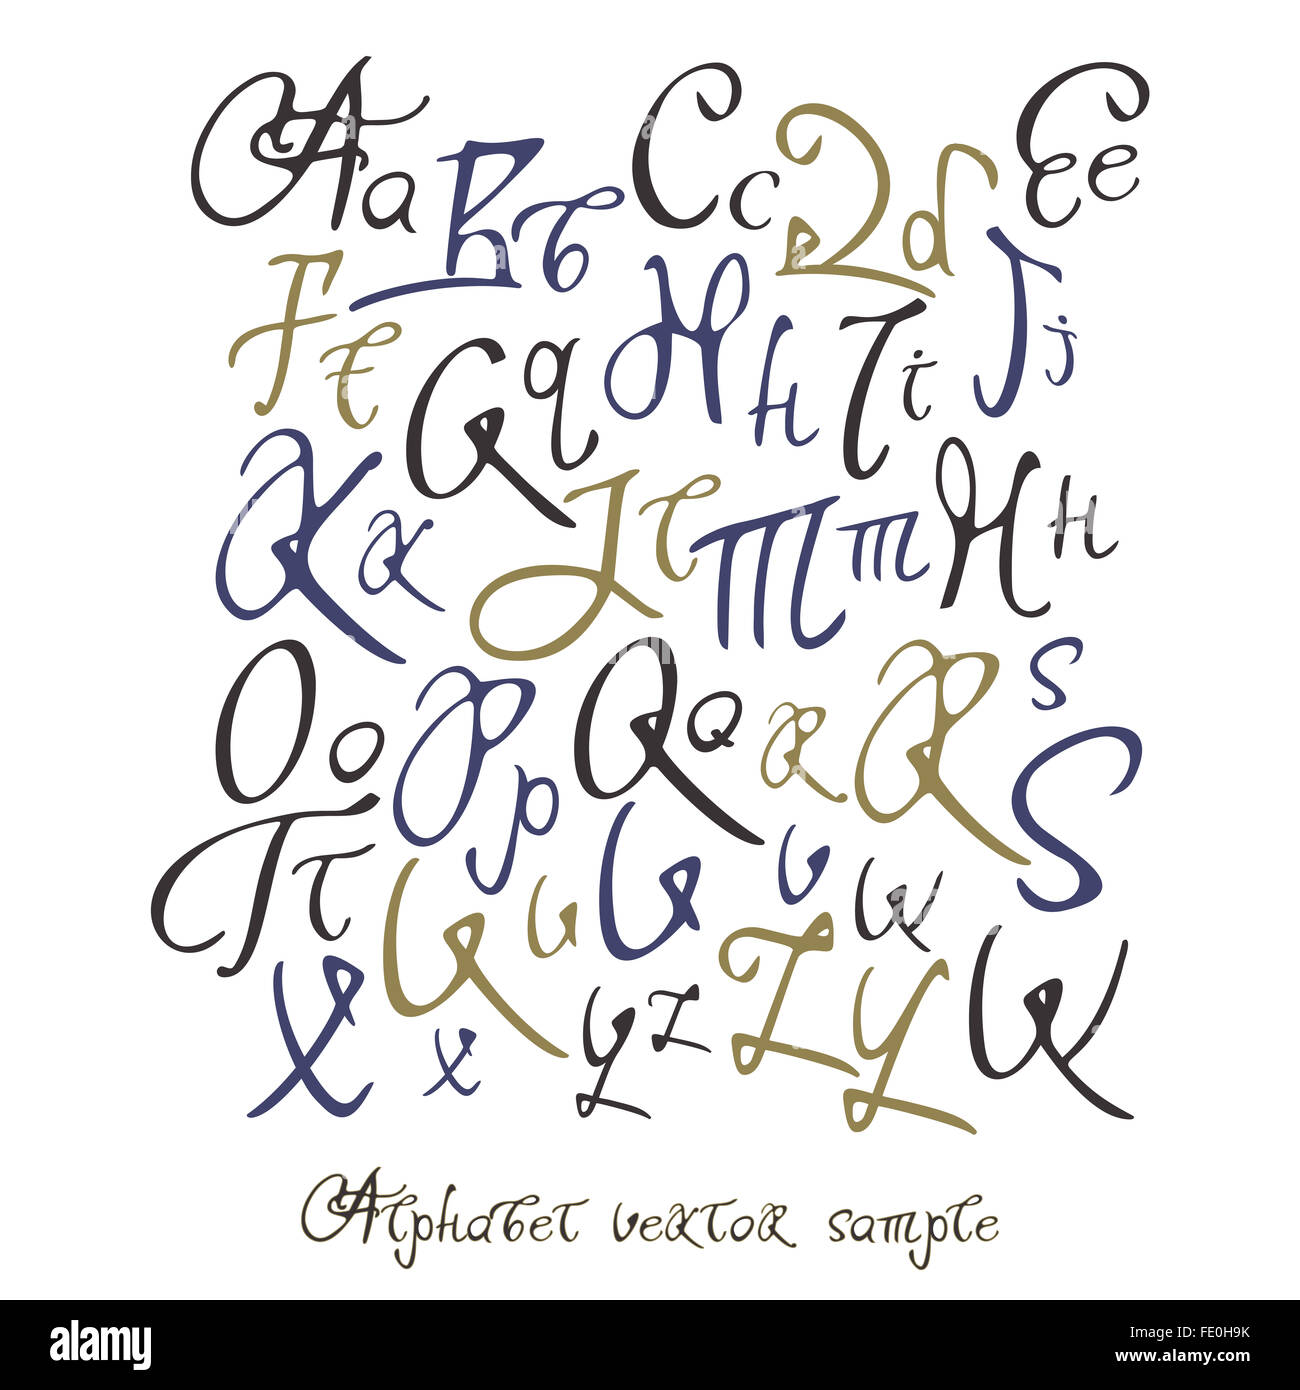 Handwritten Calligraphy Full Latin Alphabet With Sample Text Words